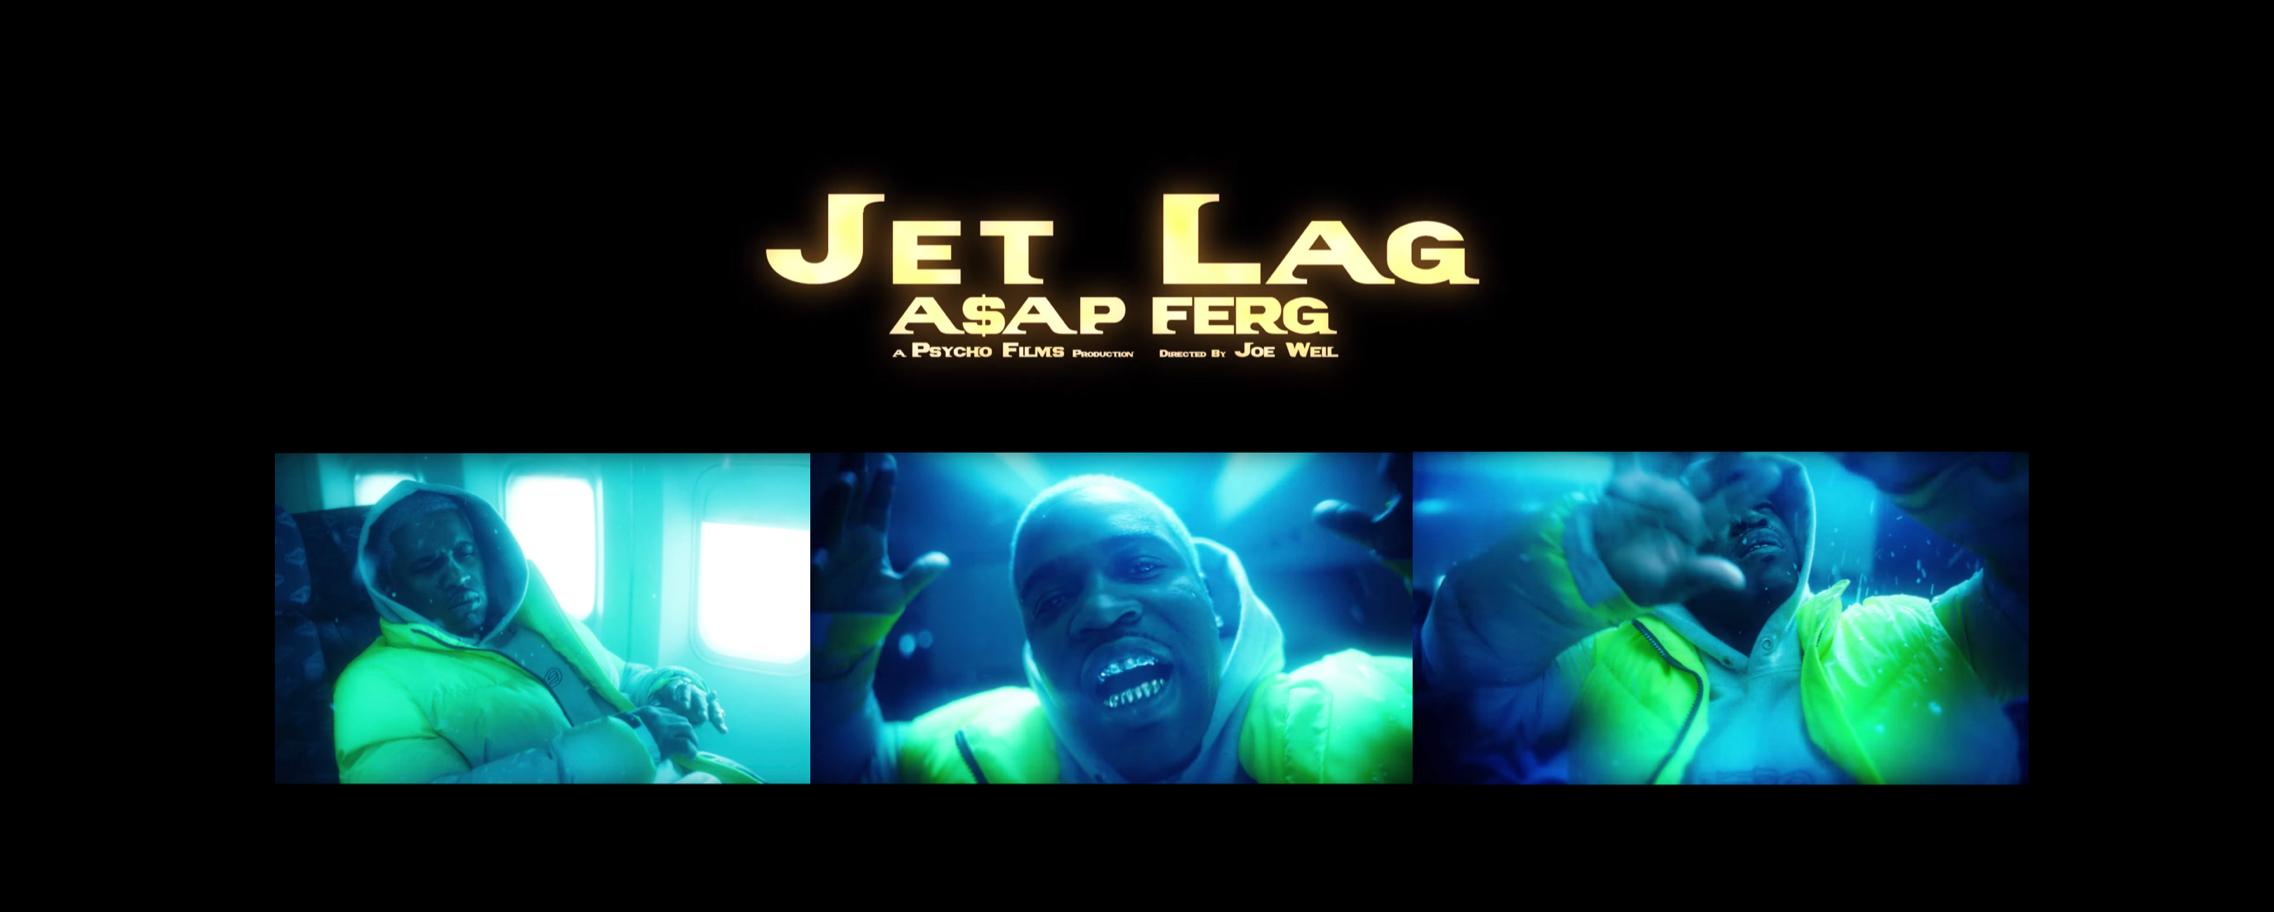 noize_asap_ferg_jetlag-3